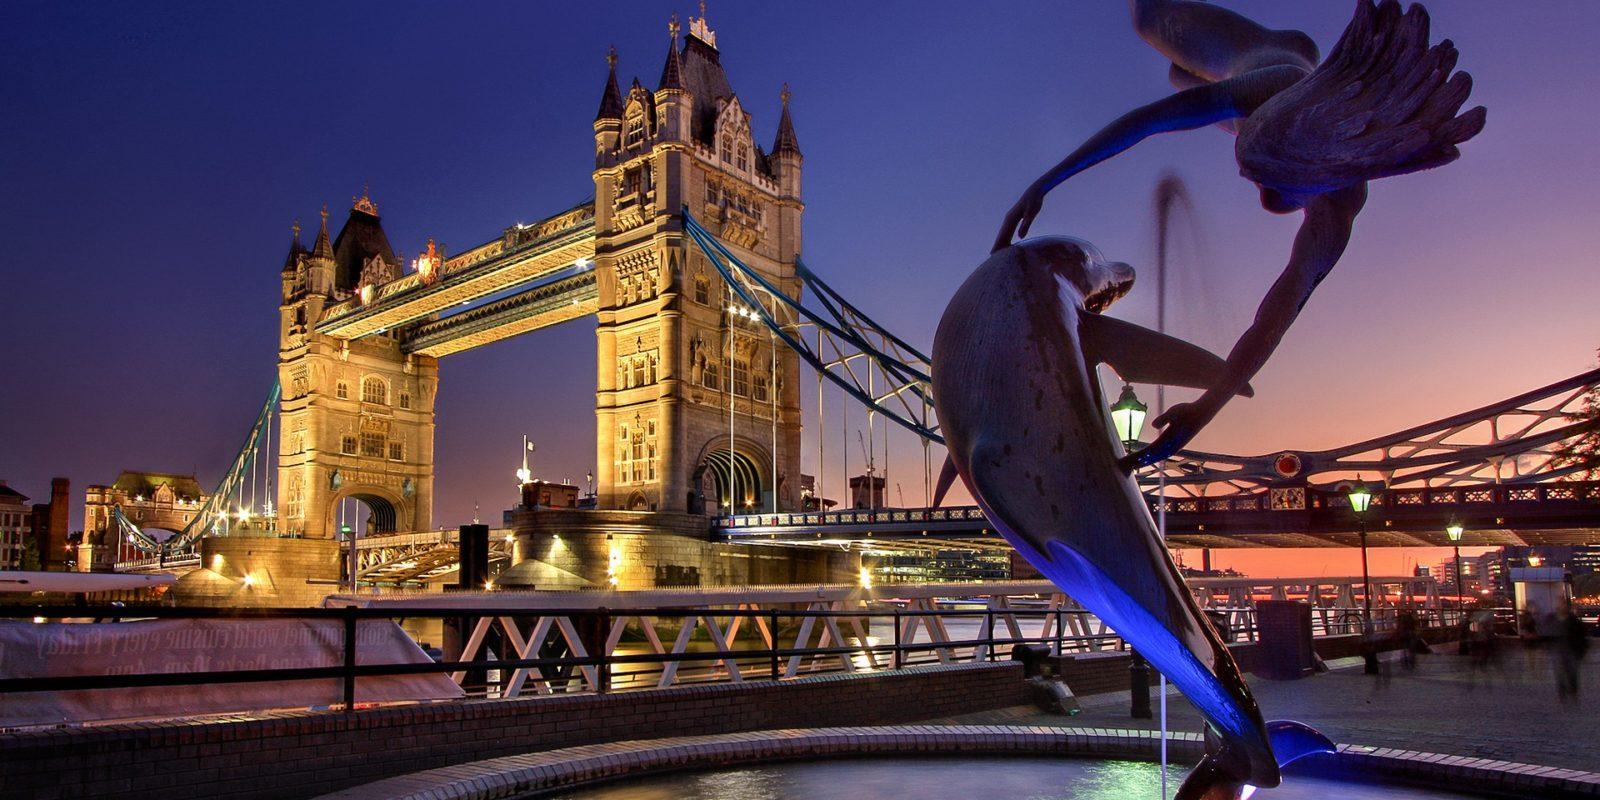 London Tower Bridge on the River Thames.